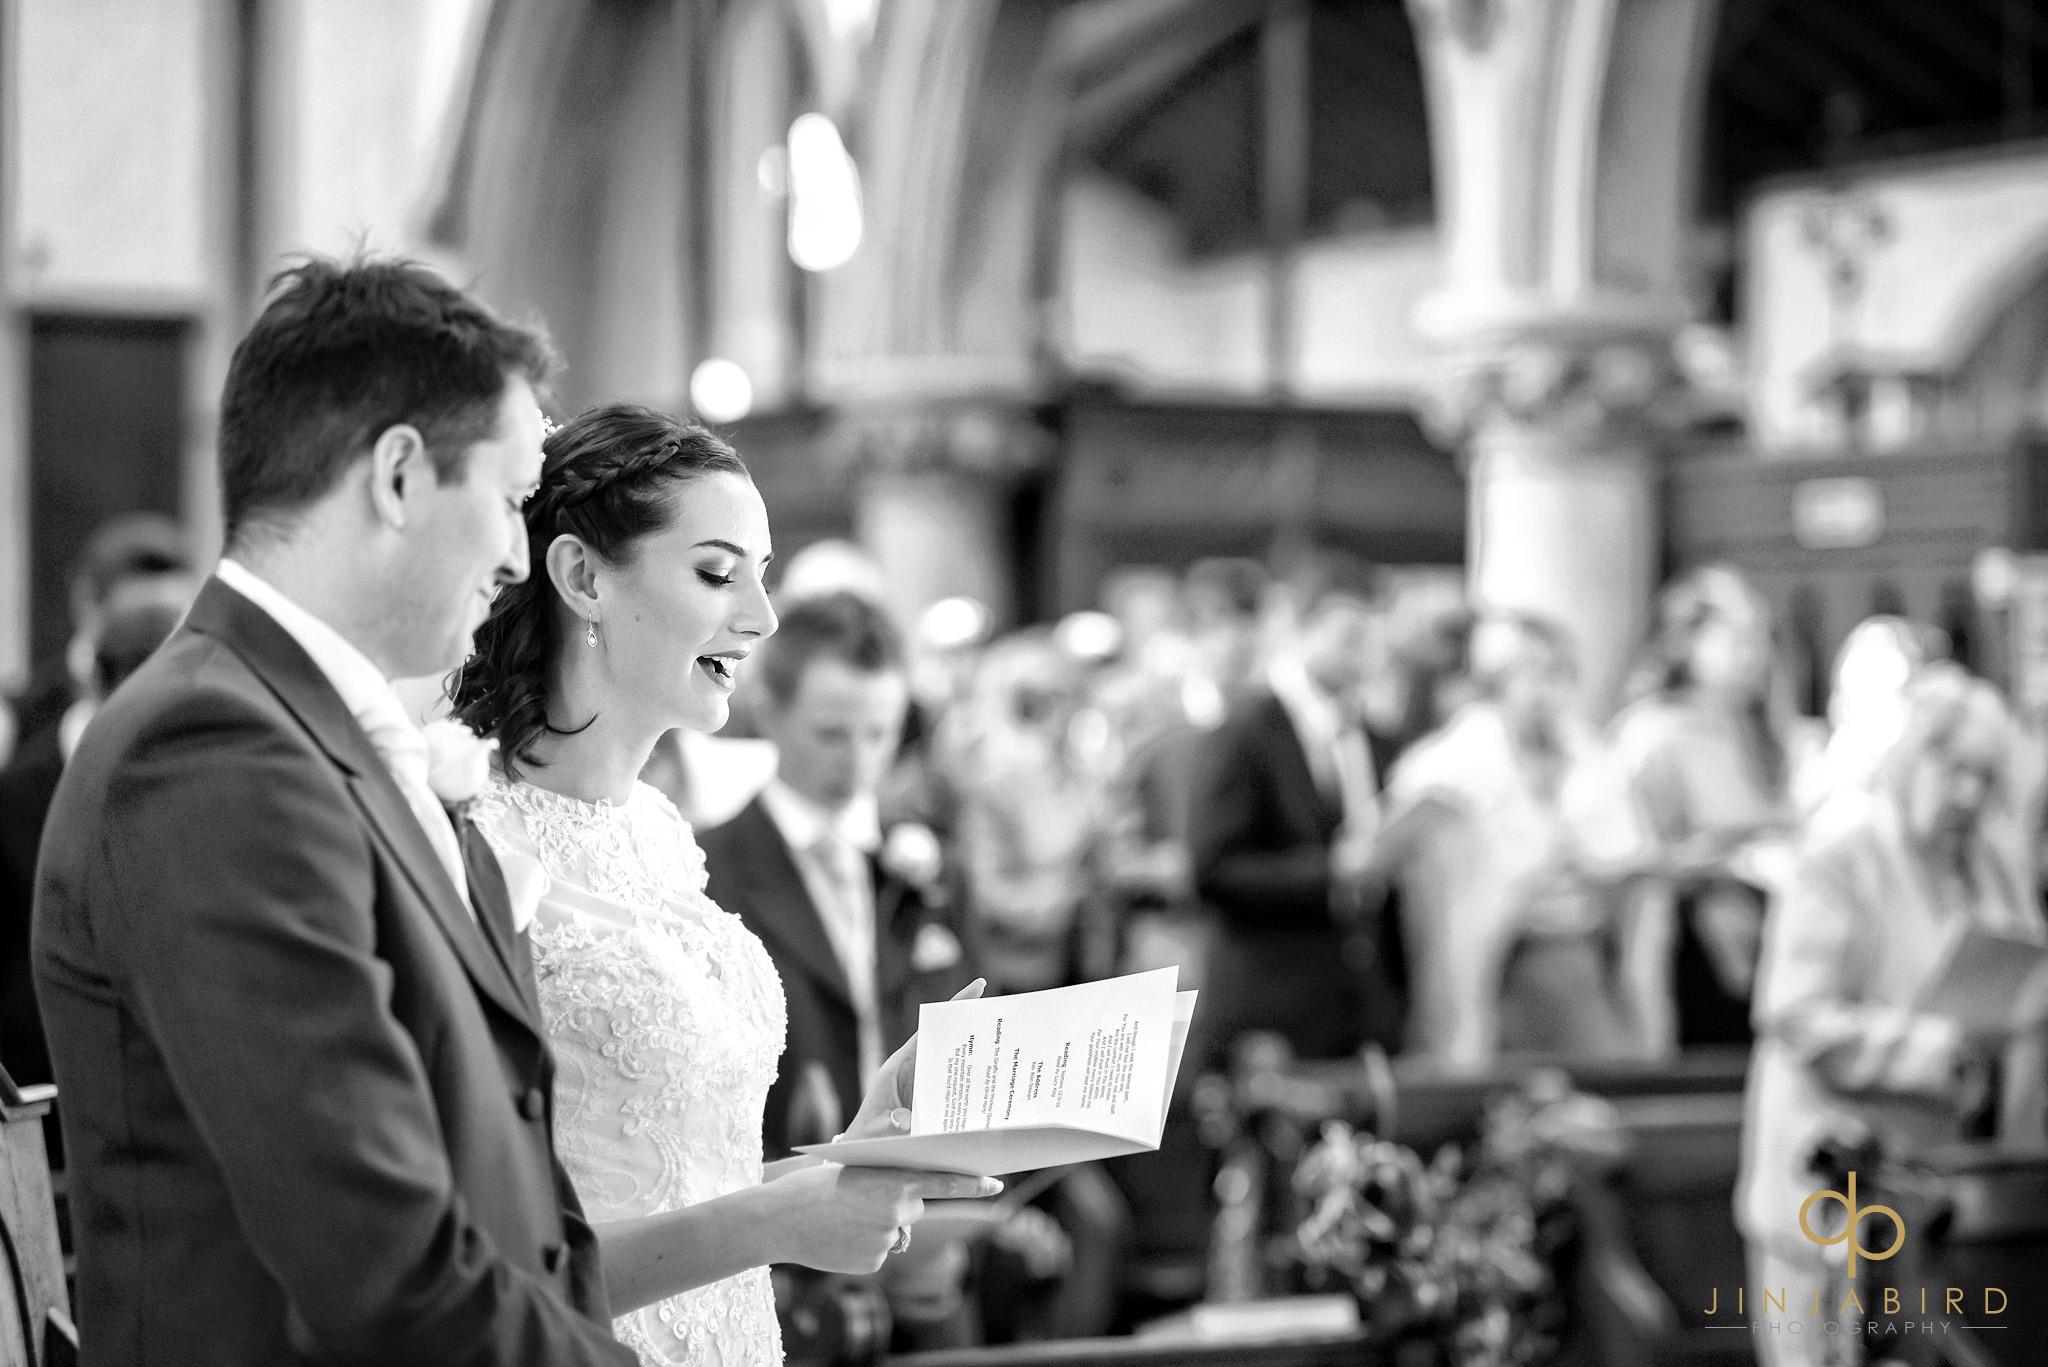 st-andrews hertford wedding